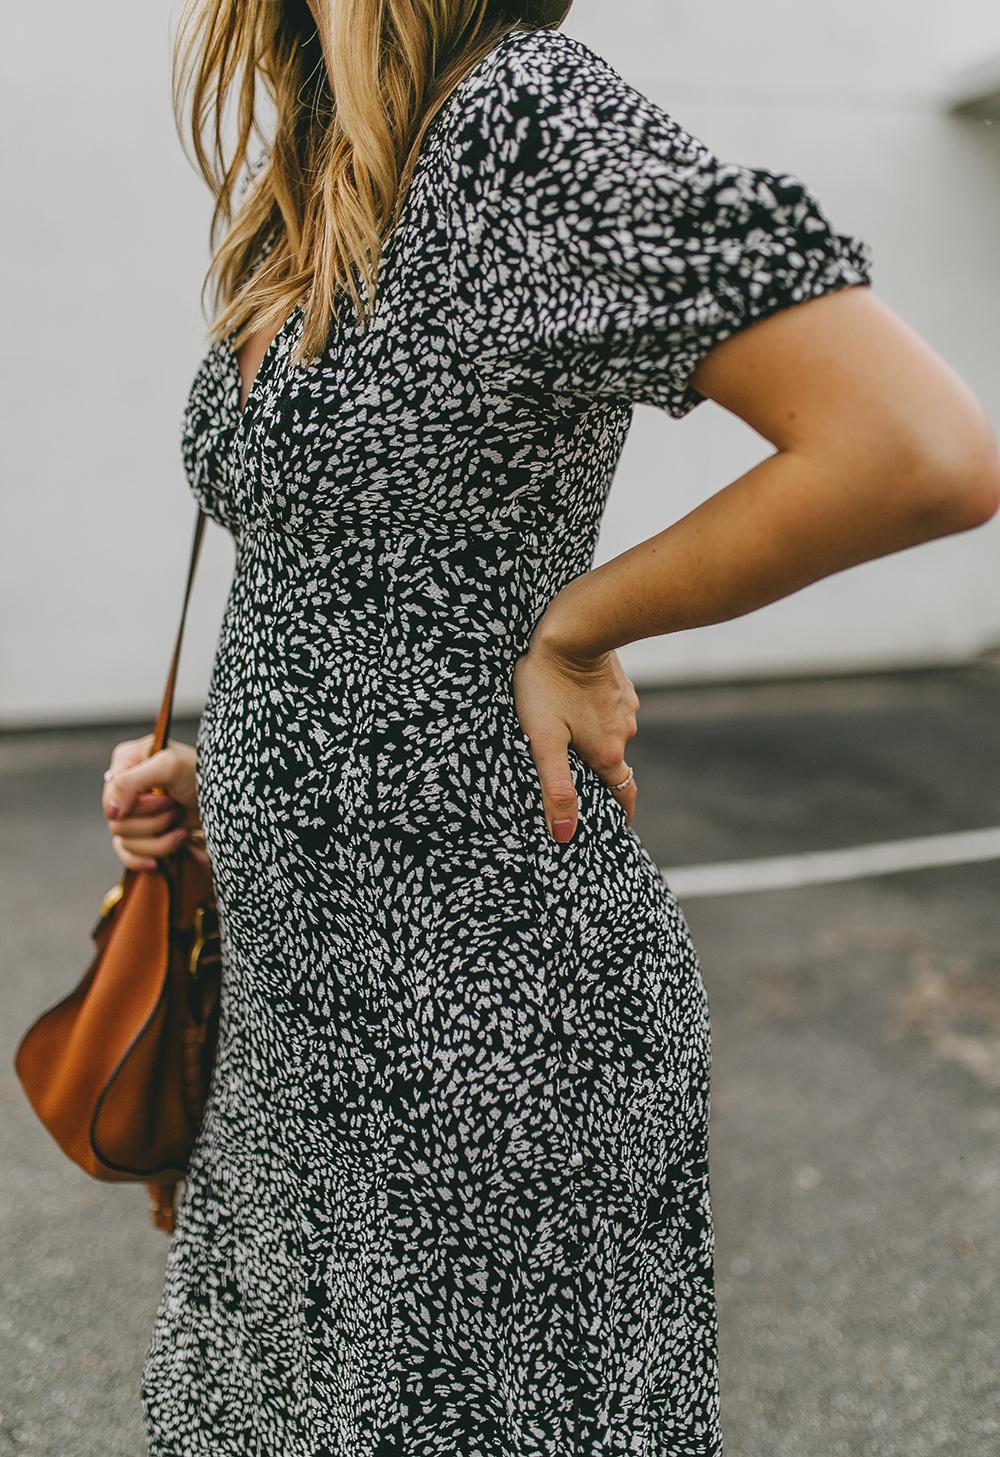 livvyland-blog-olivia-watson-free-peopl-looking-for-love-midi-dress-fedora-hat-outfit-chloe-medium-marcie-handbag-2